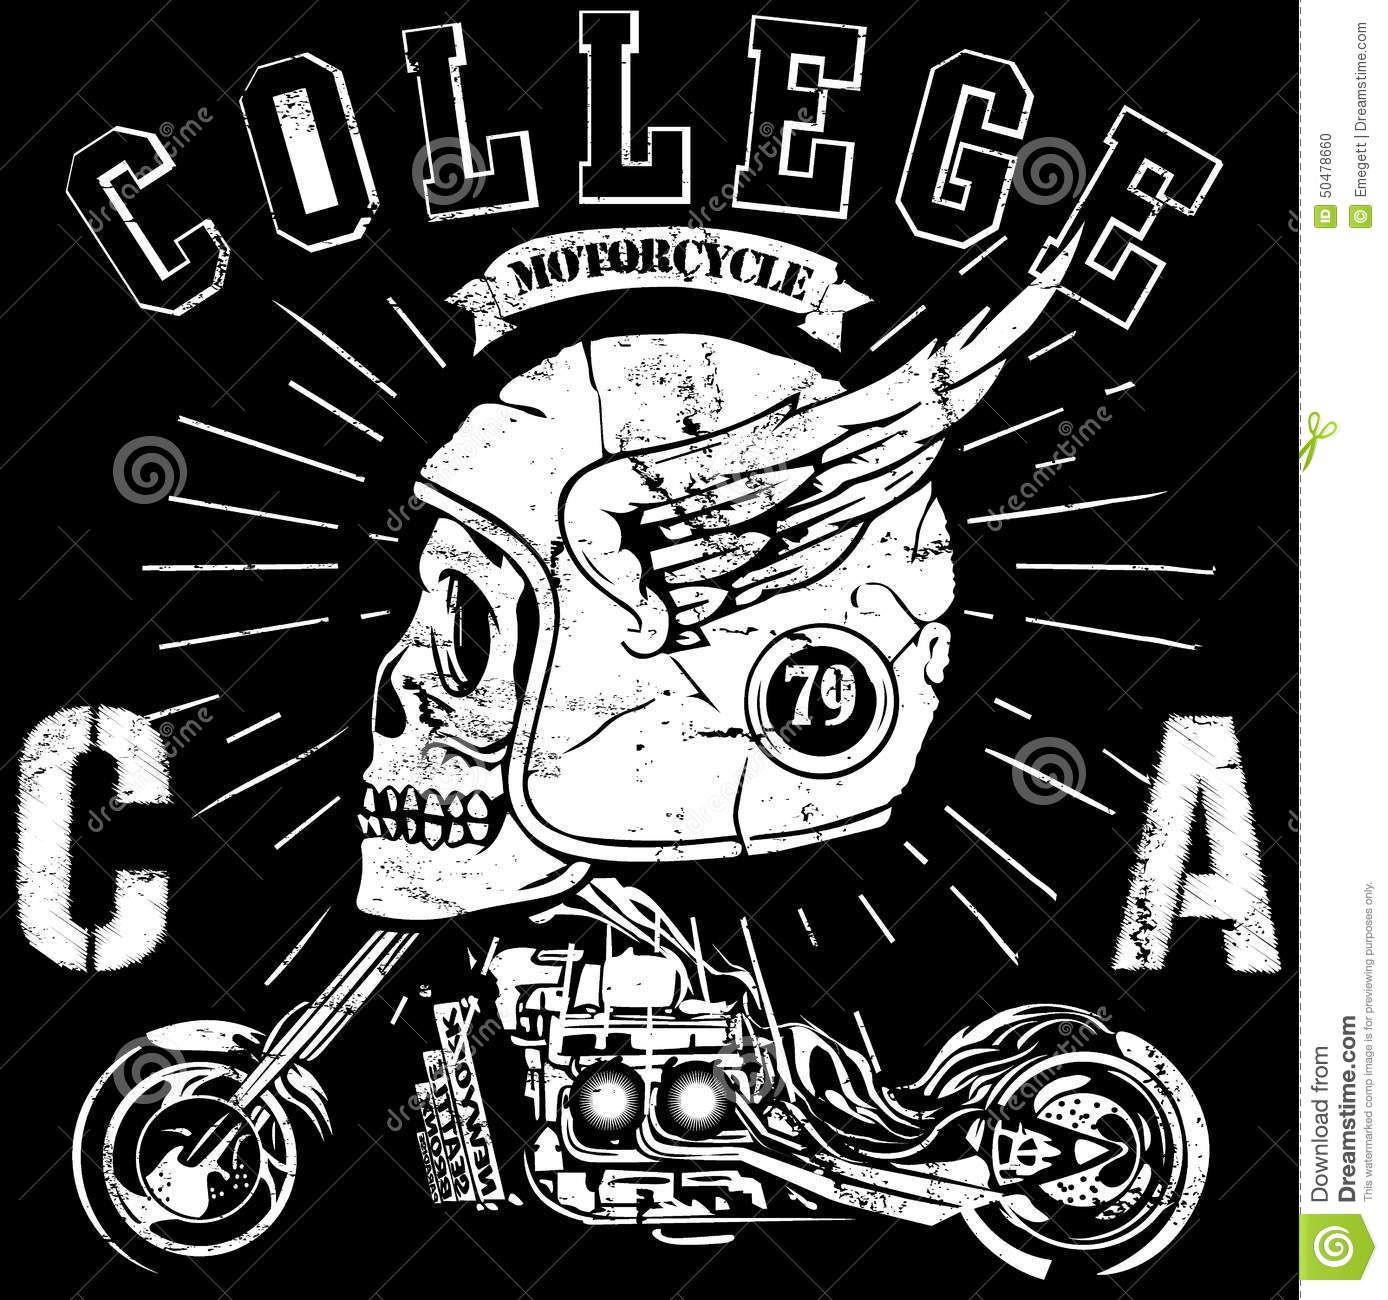 Design t shirt artwork - Vintage Biker Skull Emblem Typography T Shirt Graphics Vectors